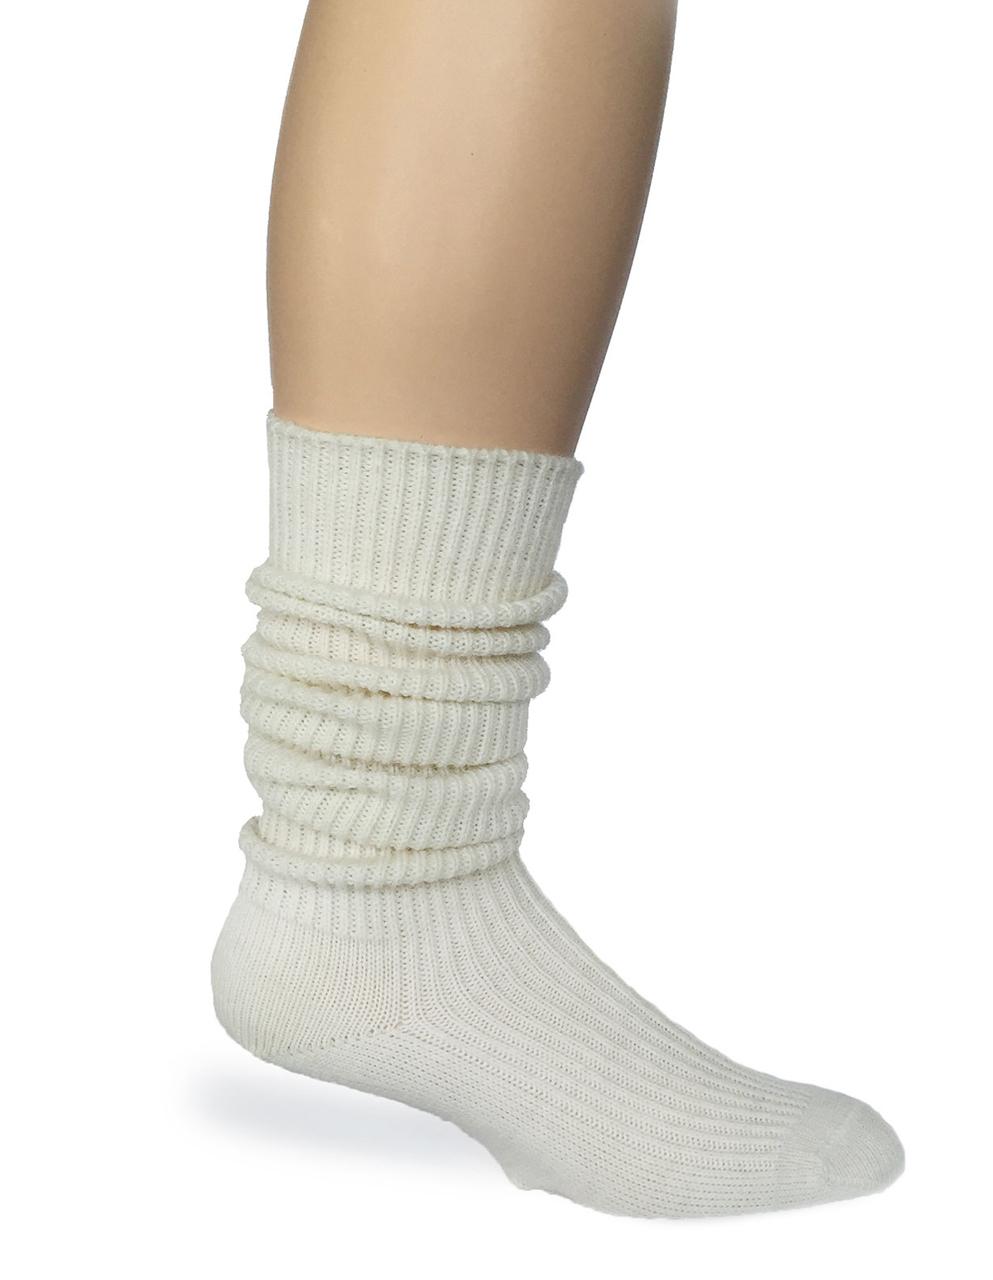 Old Fashioned Tender Tube Socks Side - Scrunched